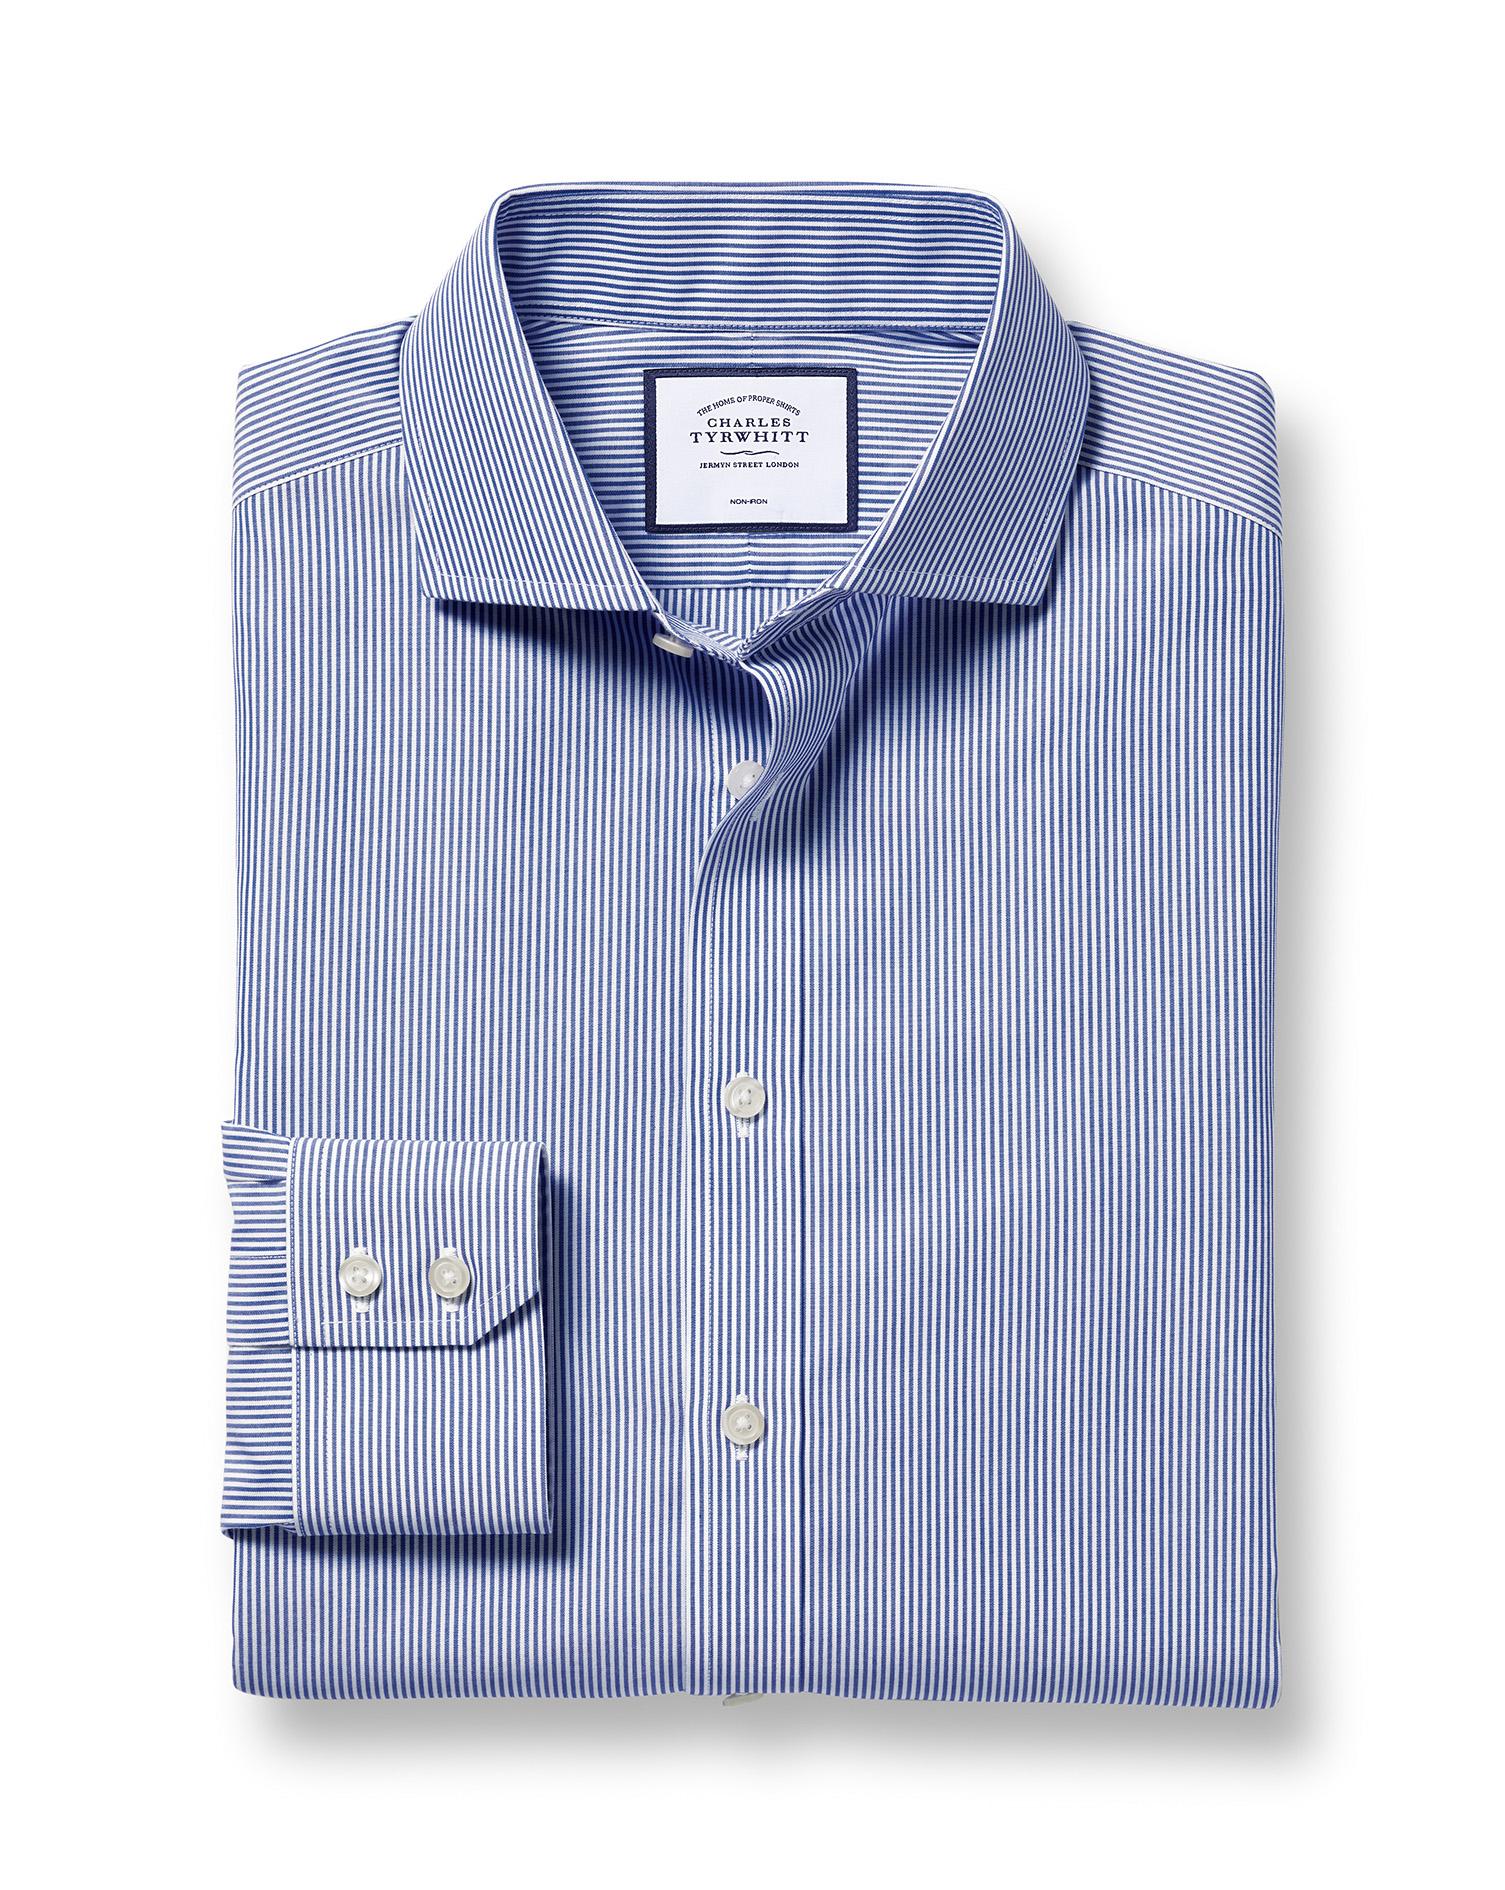 Extra Slim Fit Cutaway Non-Iron Bengal Stripe Navy Blue Cotton Formal Shirt Single Cuff Size 16/33 b